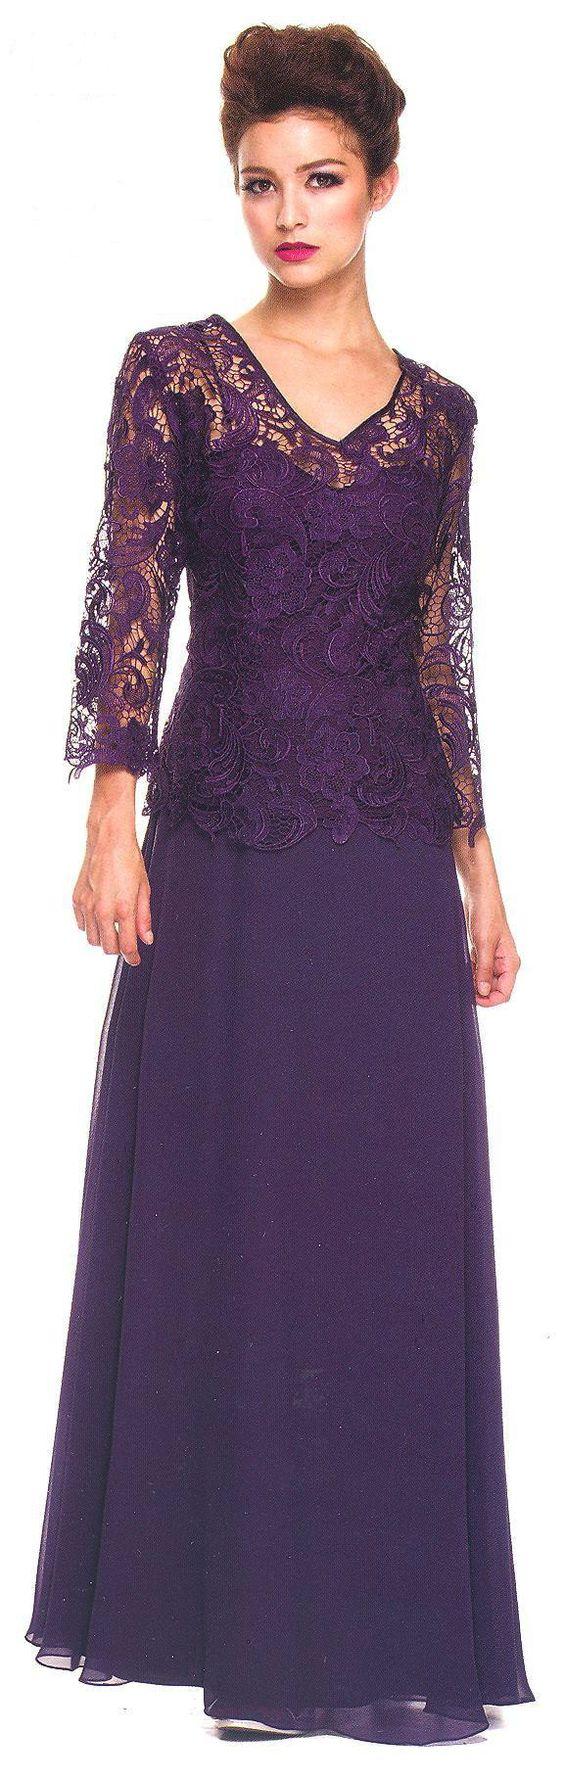 Vestido de fiesta | Moda femenina | Pinterest | Vestidos, Gowns and ...